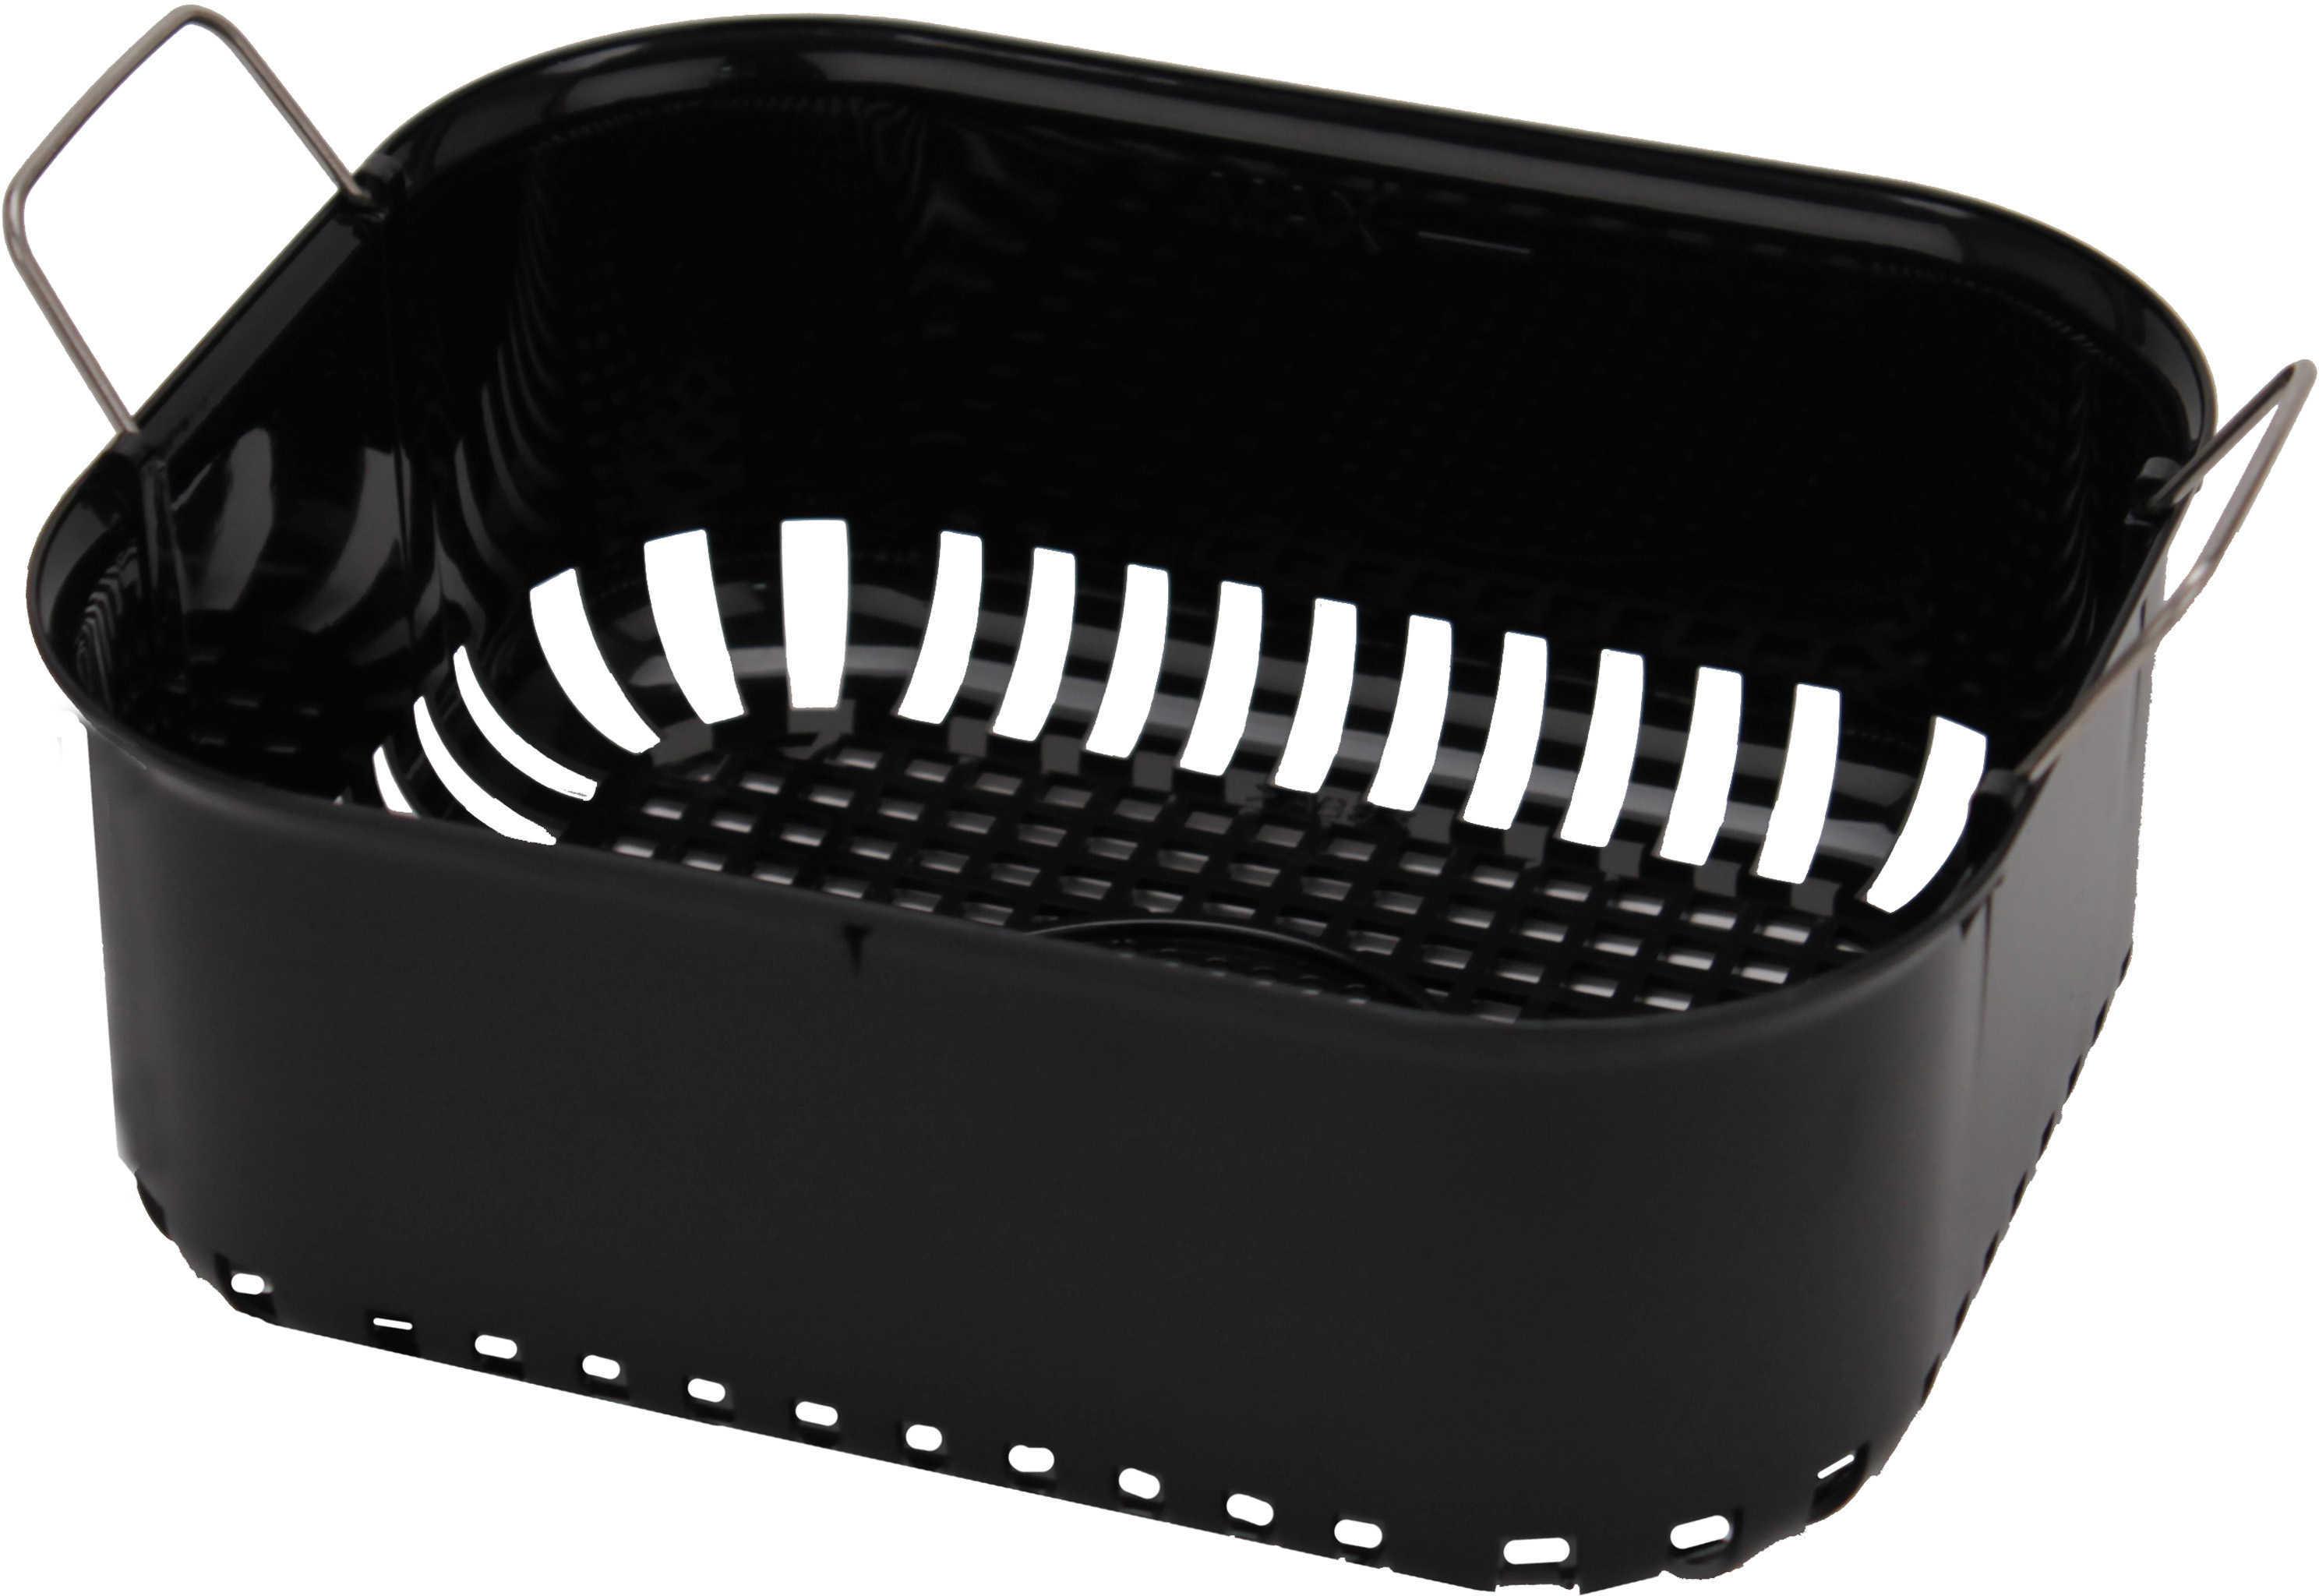 Hornady Lock N Load Sonic Cleaner Basket 2 Liter Md: 150206